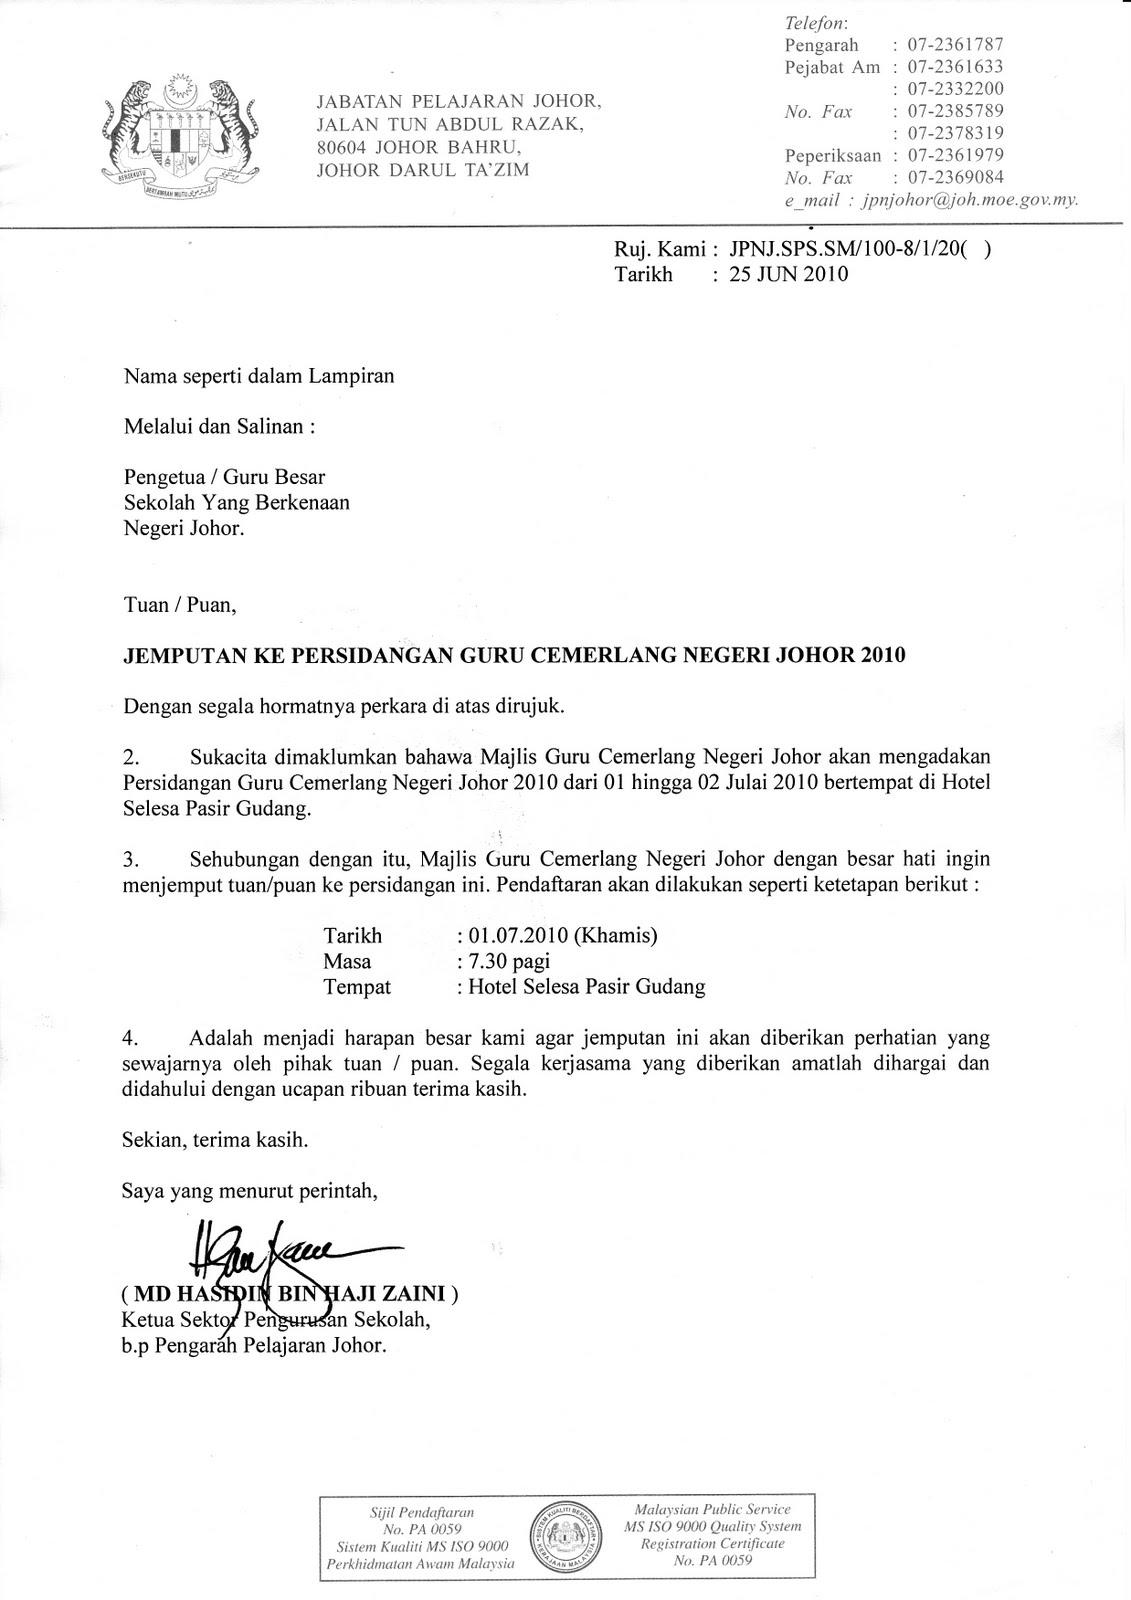 Majlis Guru Cemerlang Pasir Gudang Surat Jemputan Ke Persidangan